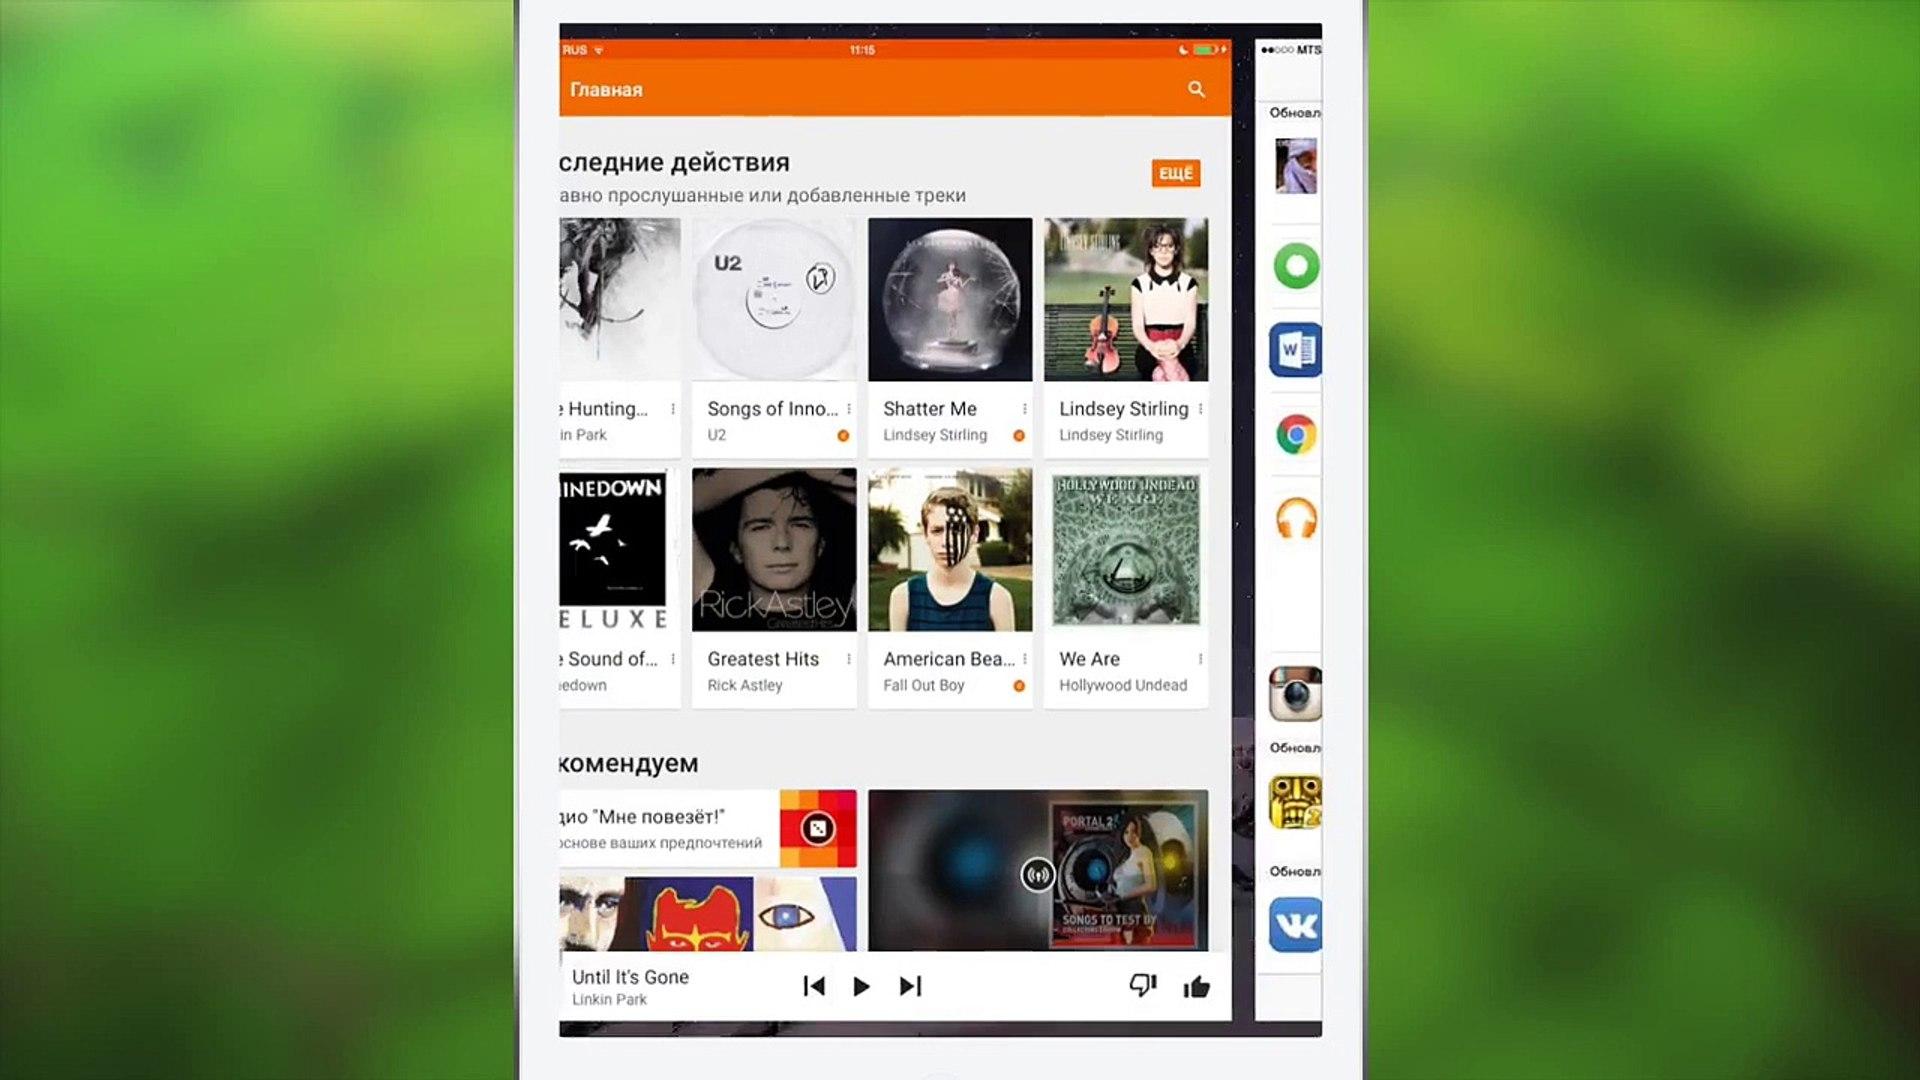 [99 сек.] Google Play Музыка для iPhone и iPad